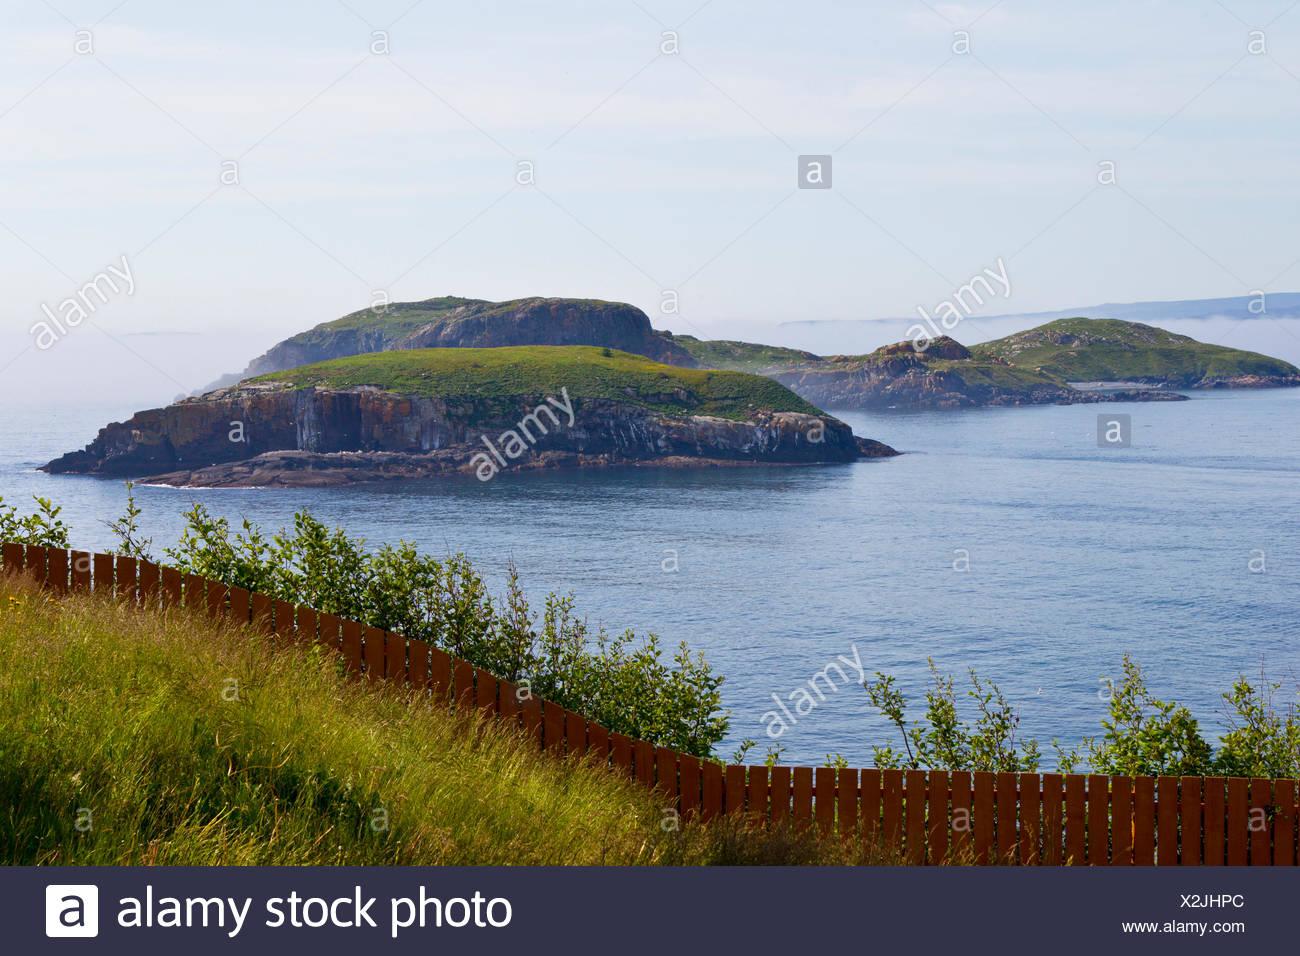 Ship Island, Witless Bay Ecological Reserve, Newfoundland, Canada - Stock Image